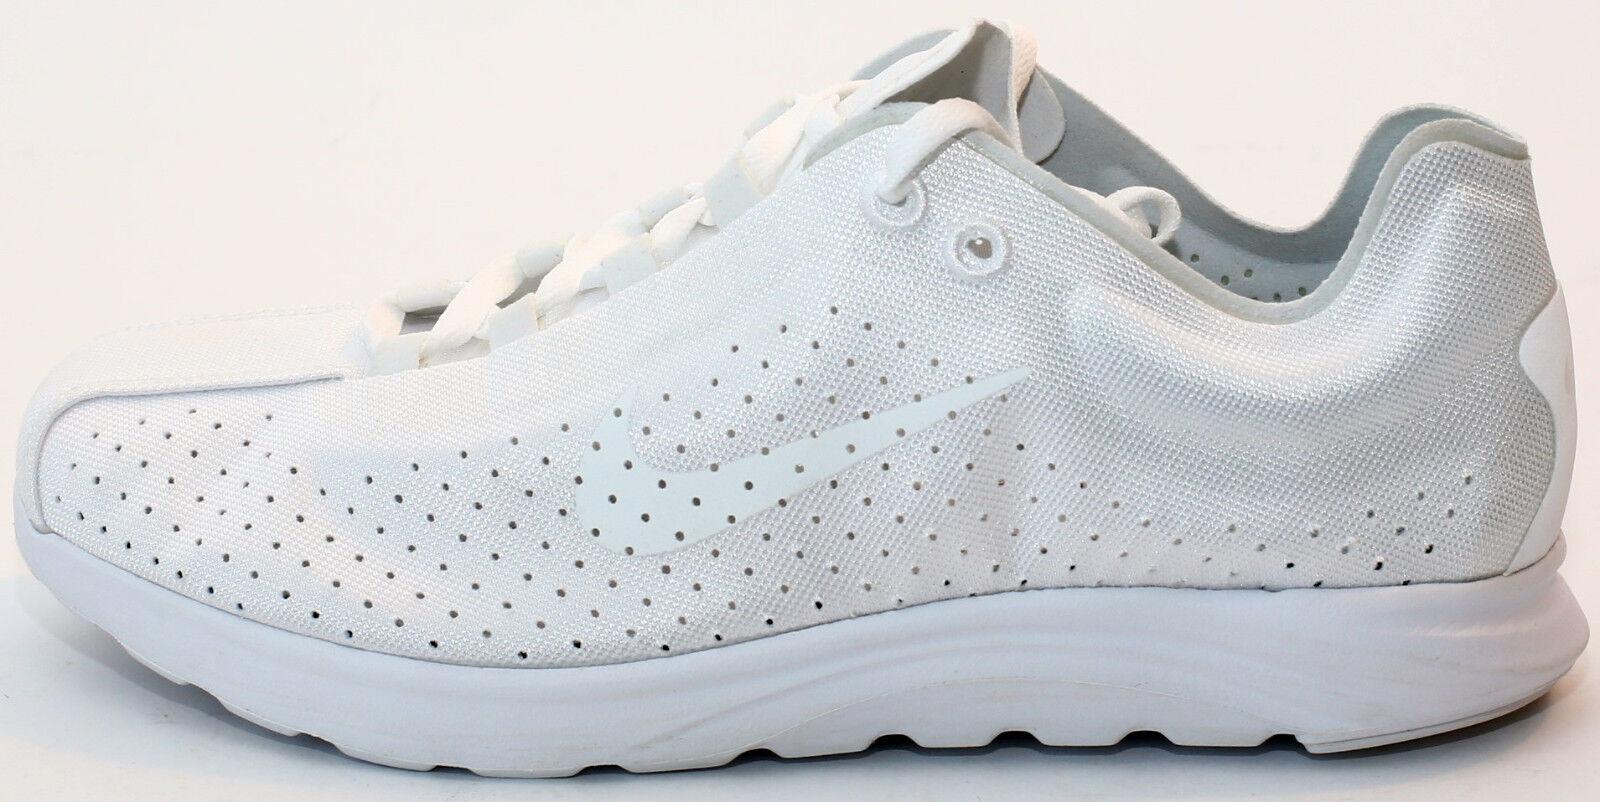 Nike 898027100 Mayfly Lite BR Sneaker Turnschuhe - Größe 46 - Weiß - Neu (F)